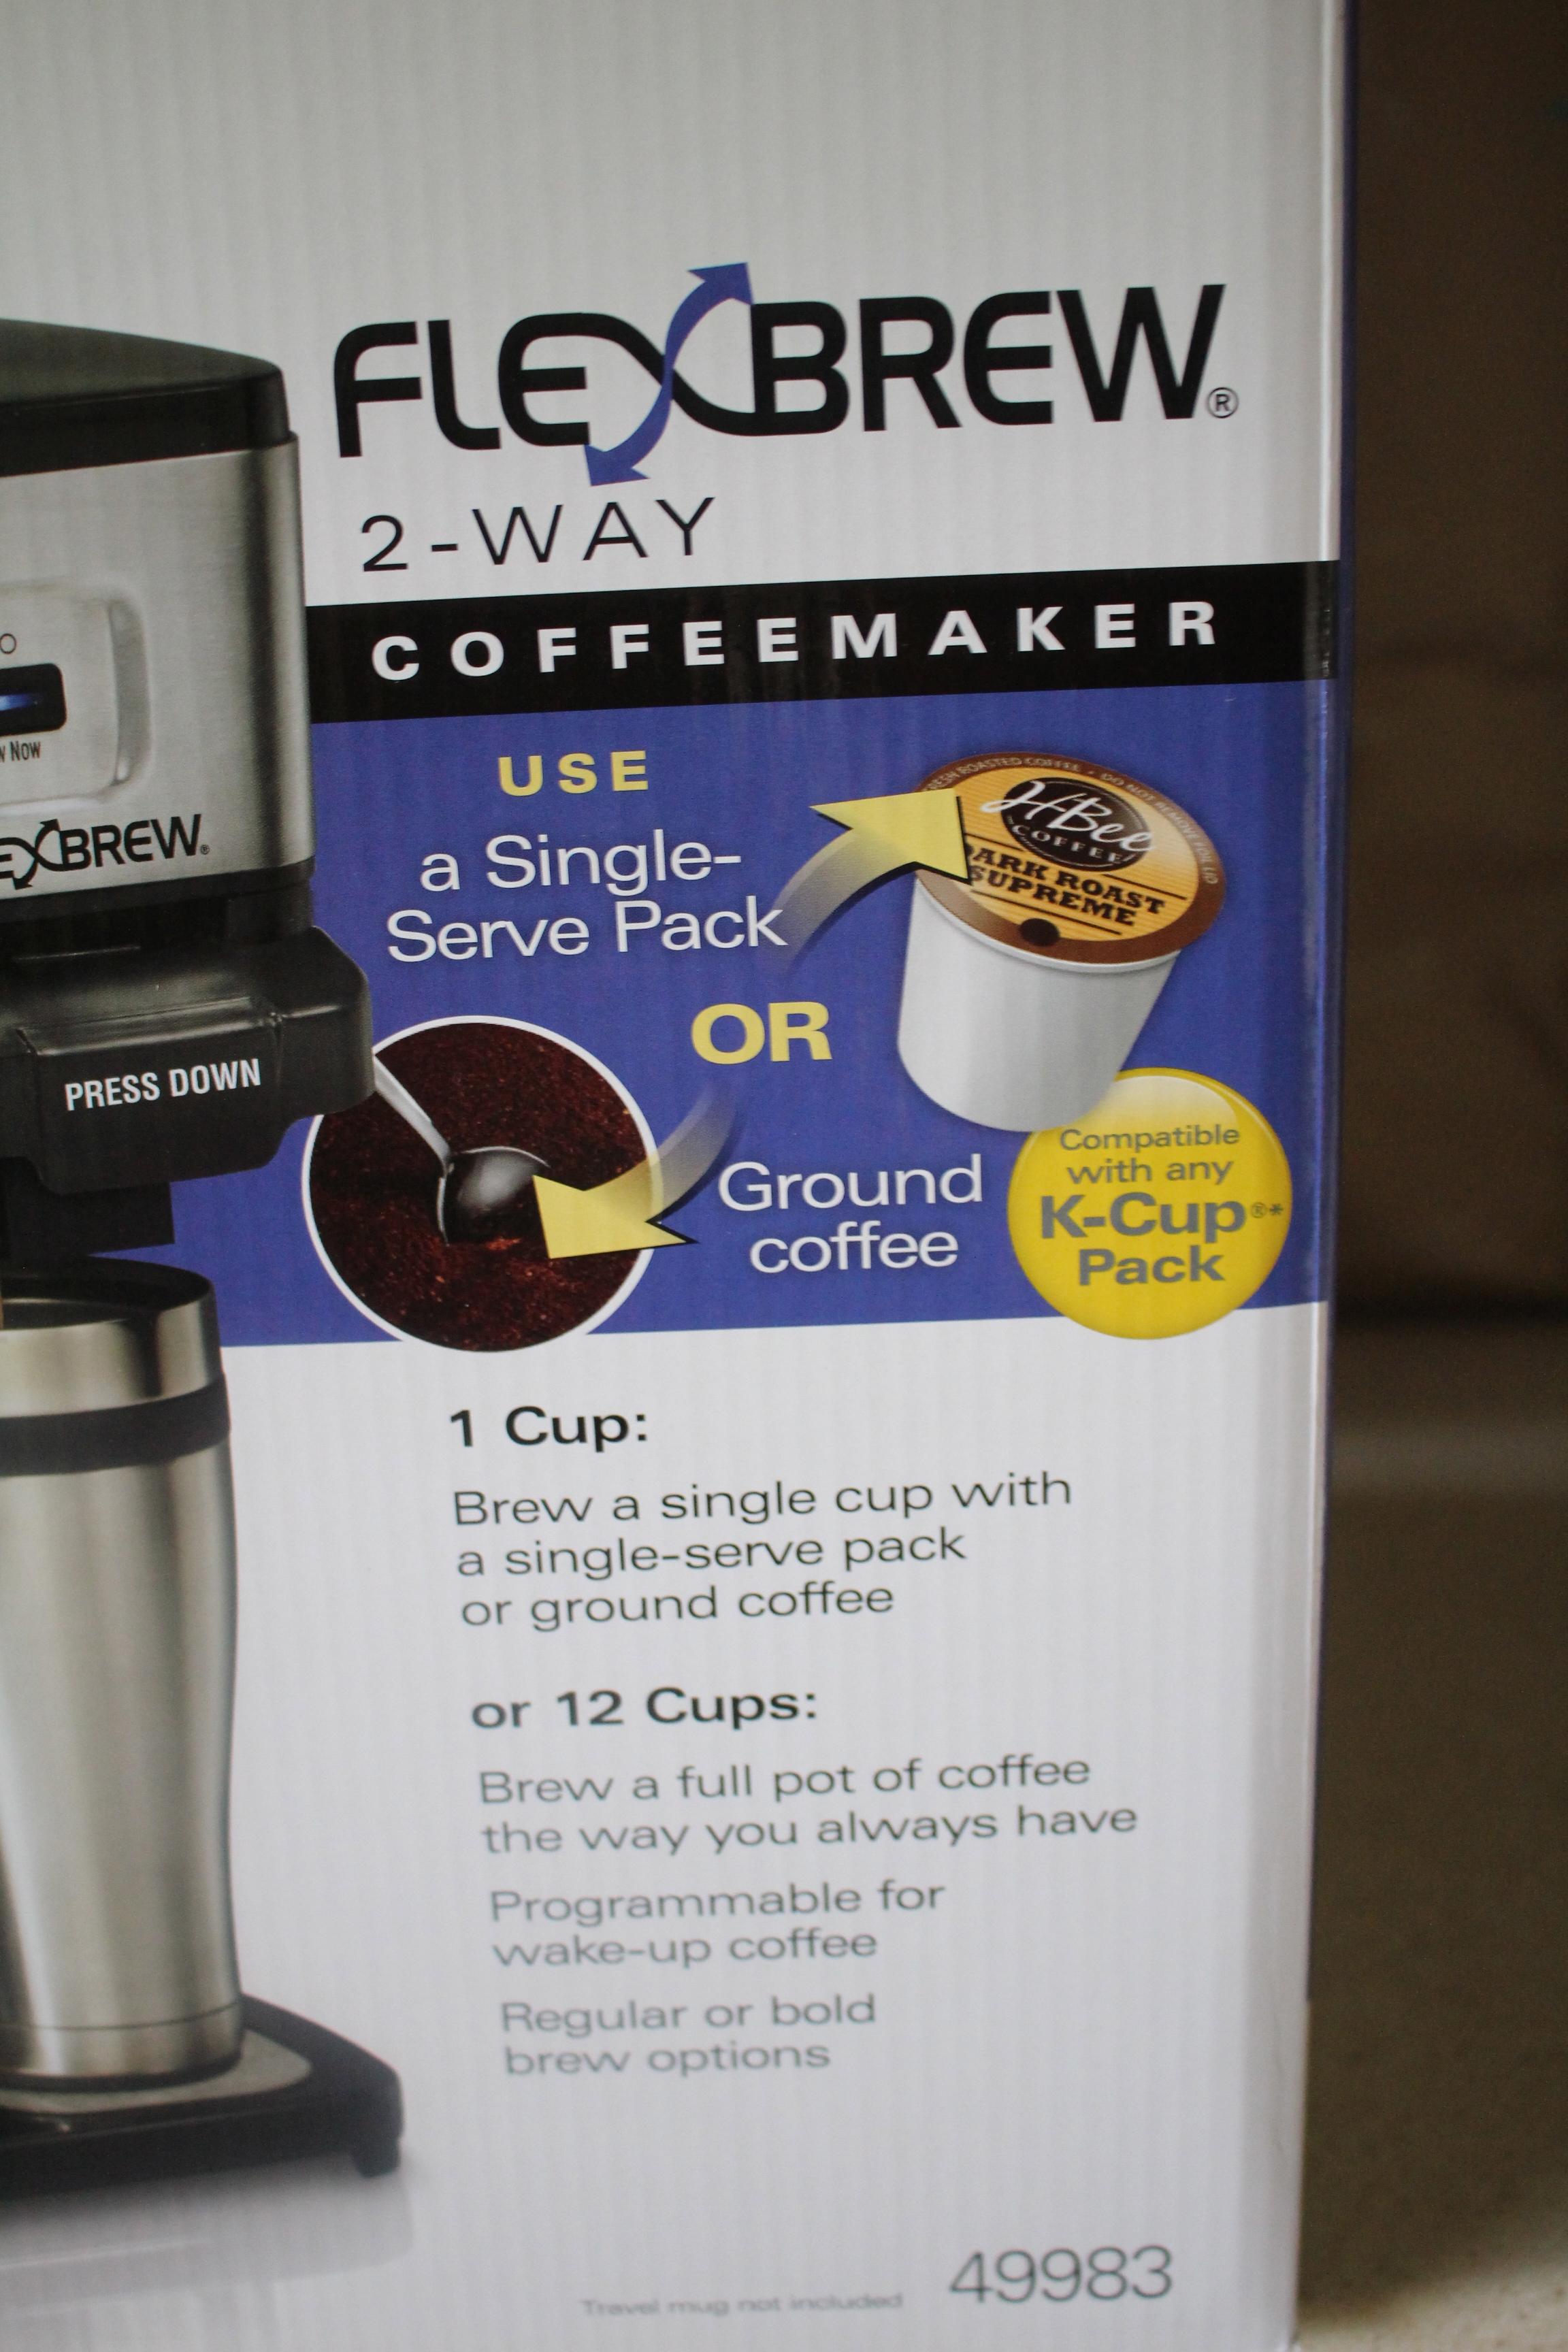 Coffee Maker Carafe And Single Cup Hamilton Beach Flexbrew 2 Way Coffee Maker Felt Like A Foodie